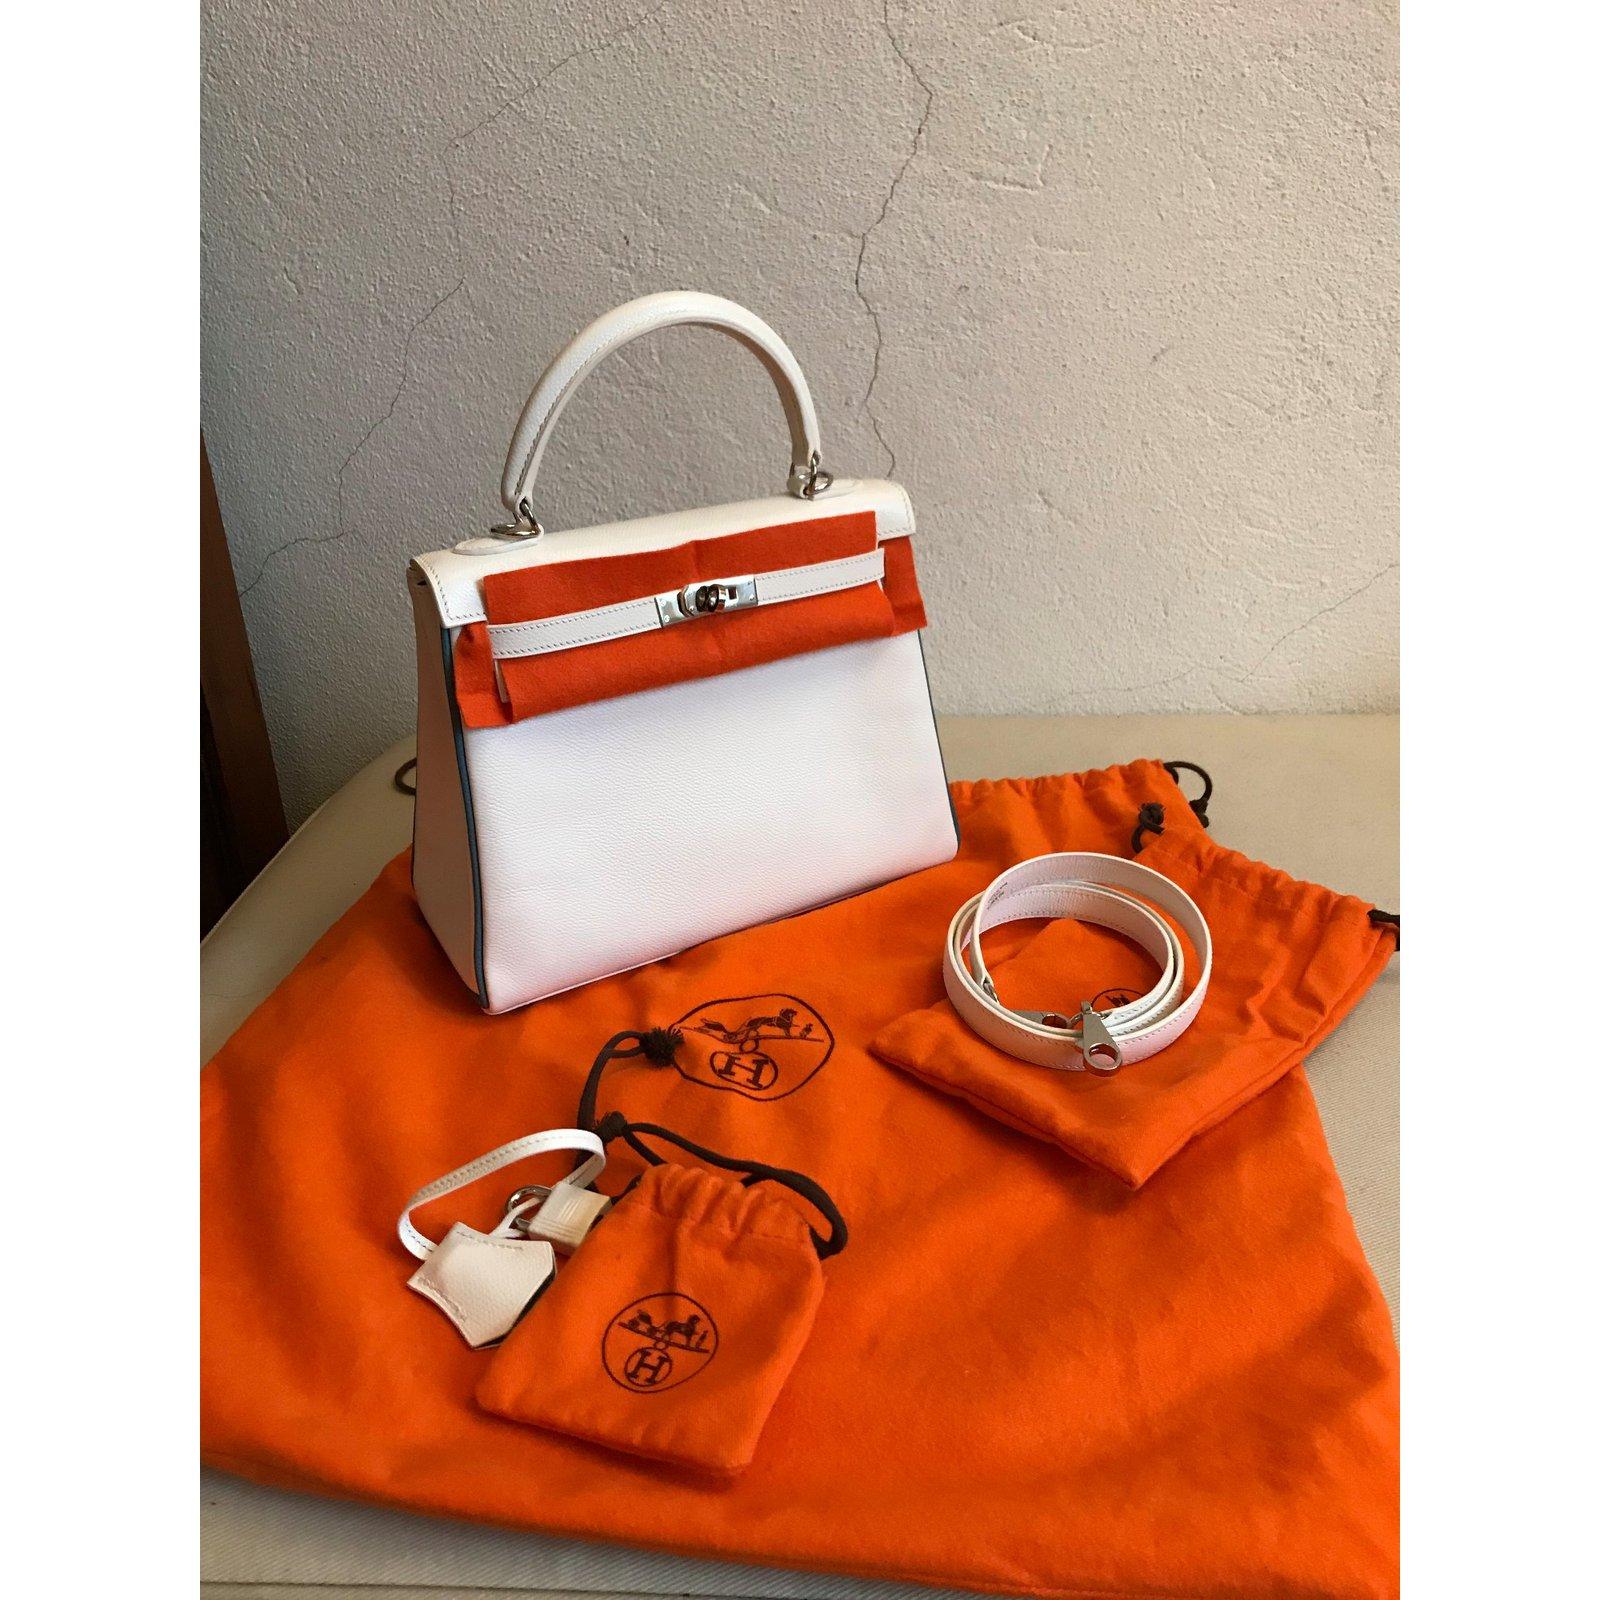 27b008bf40f7 Hermès Kelly 25 Handbags Leather White ref.61477 - Joli Closet